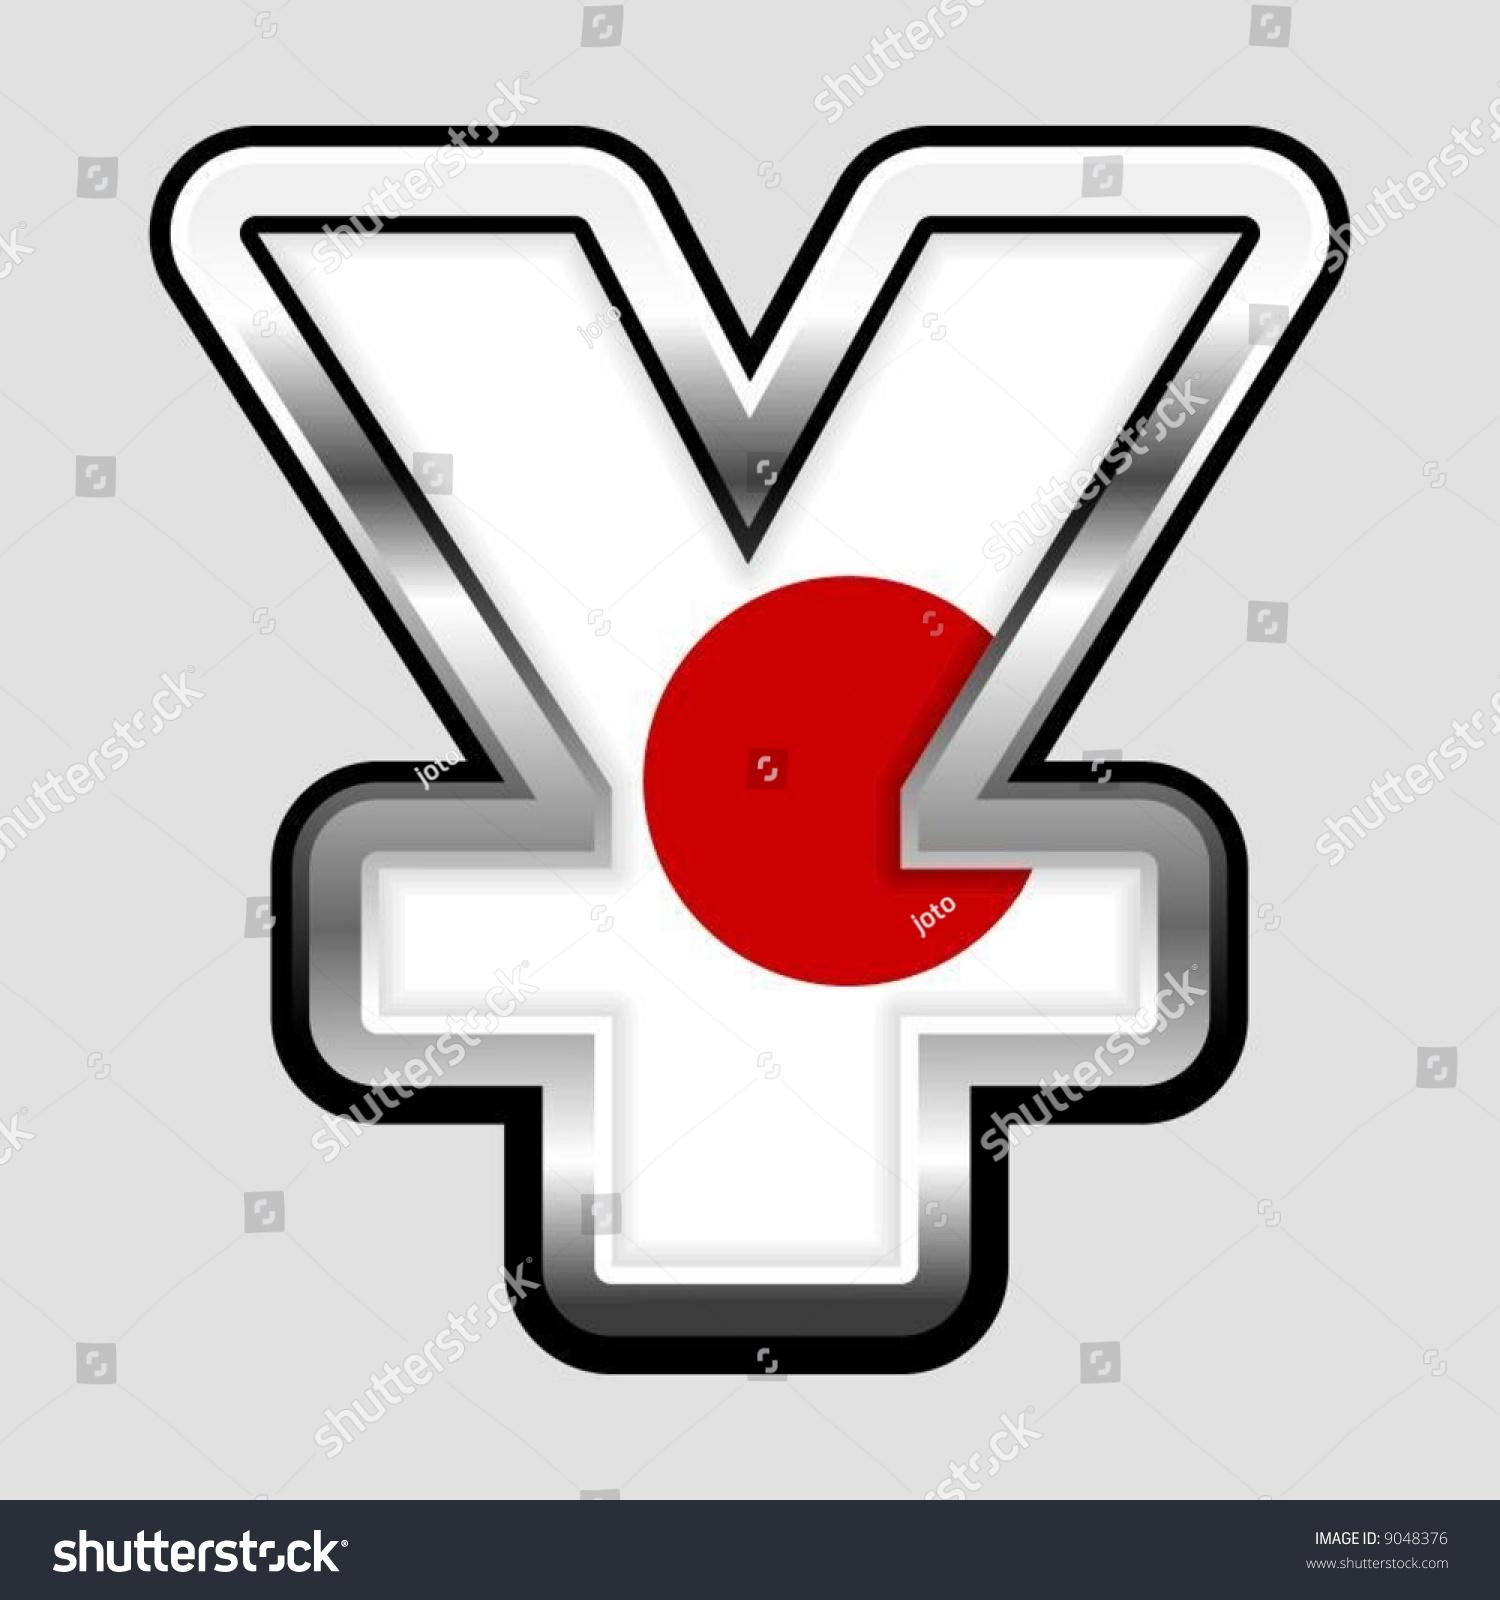 Japanese yen symbol stock vector 9048376 shutterstock japanese yen symbol biocorpaavc Choice Image